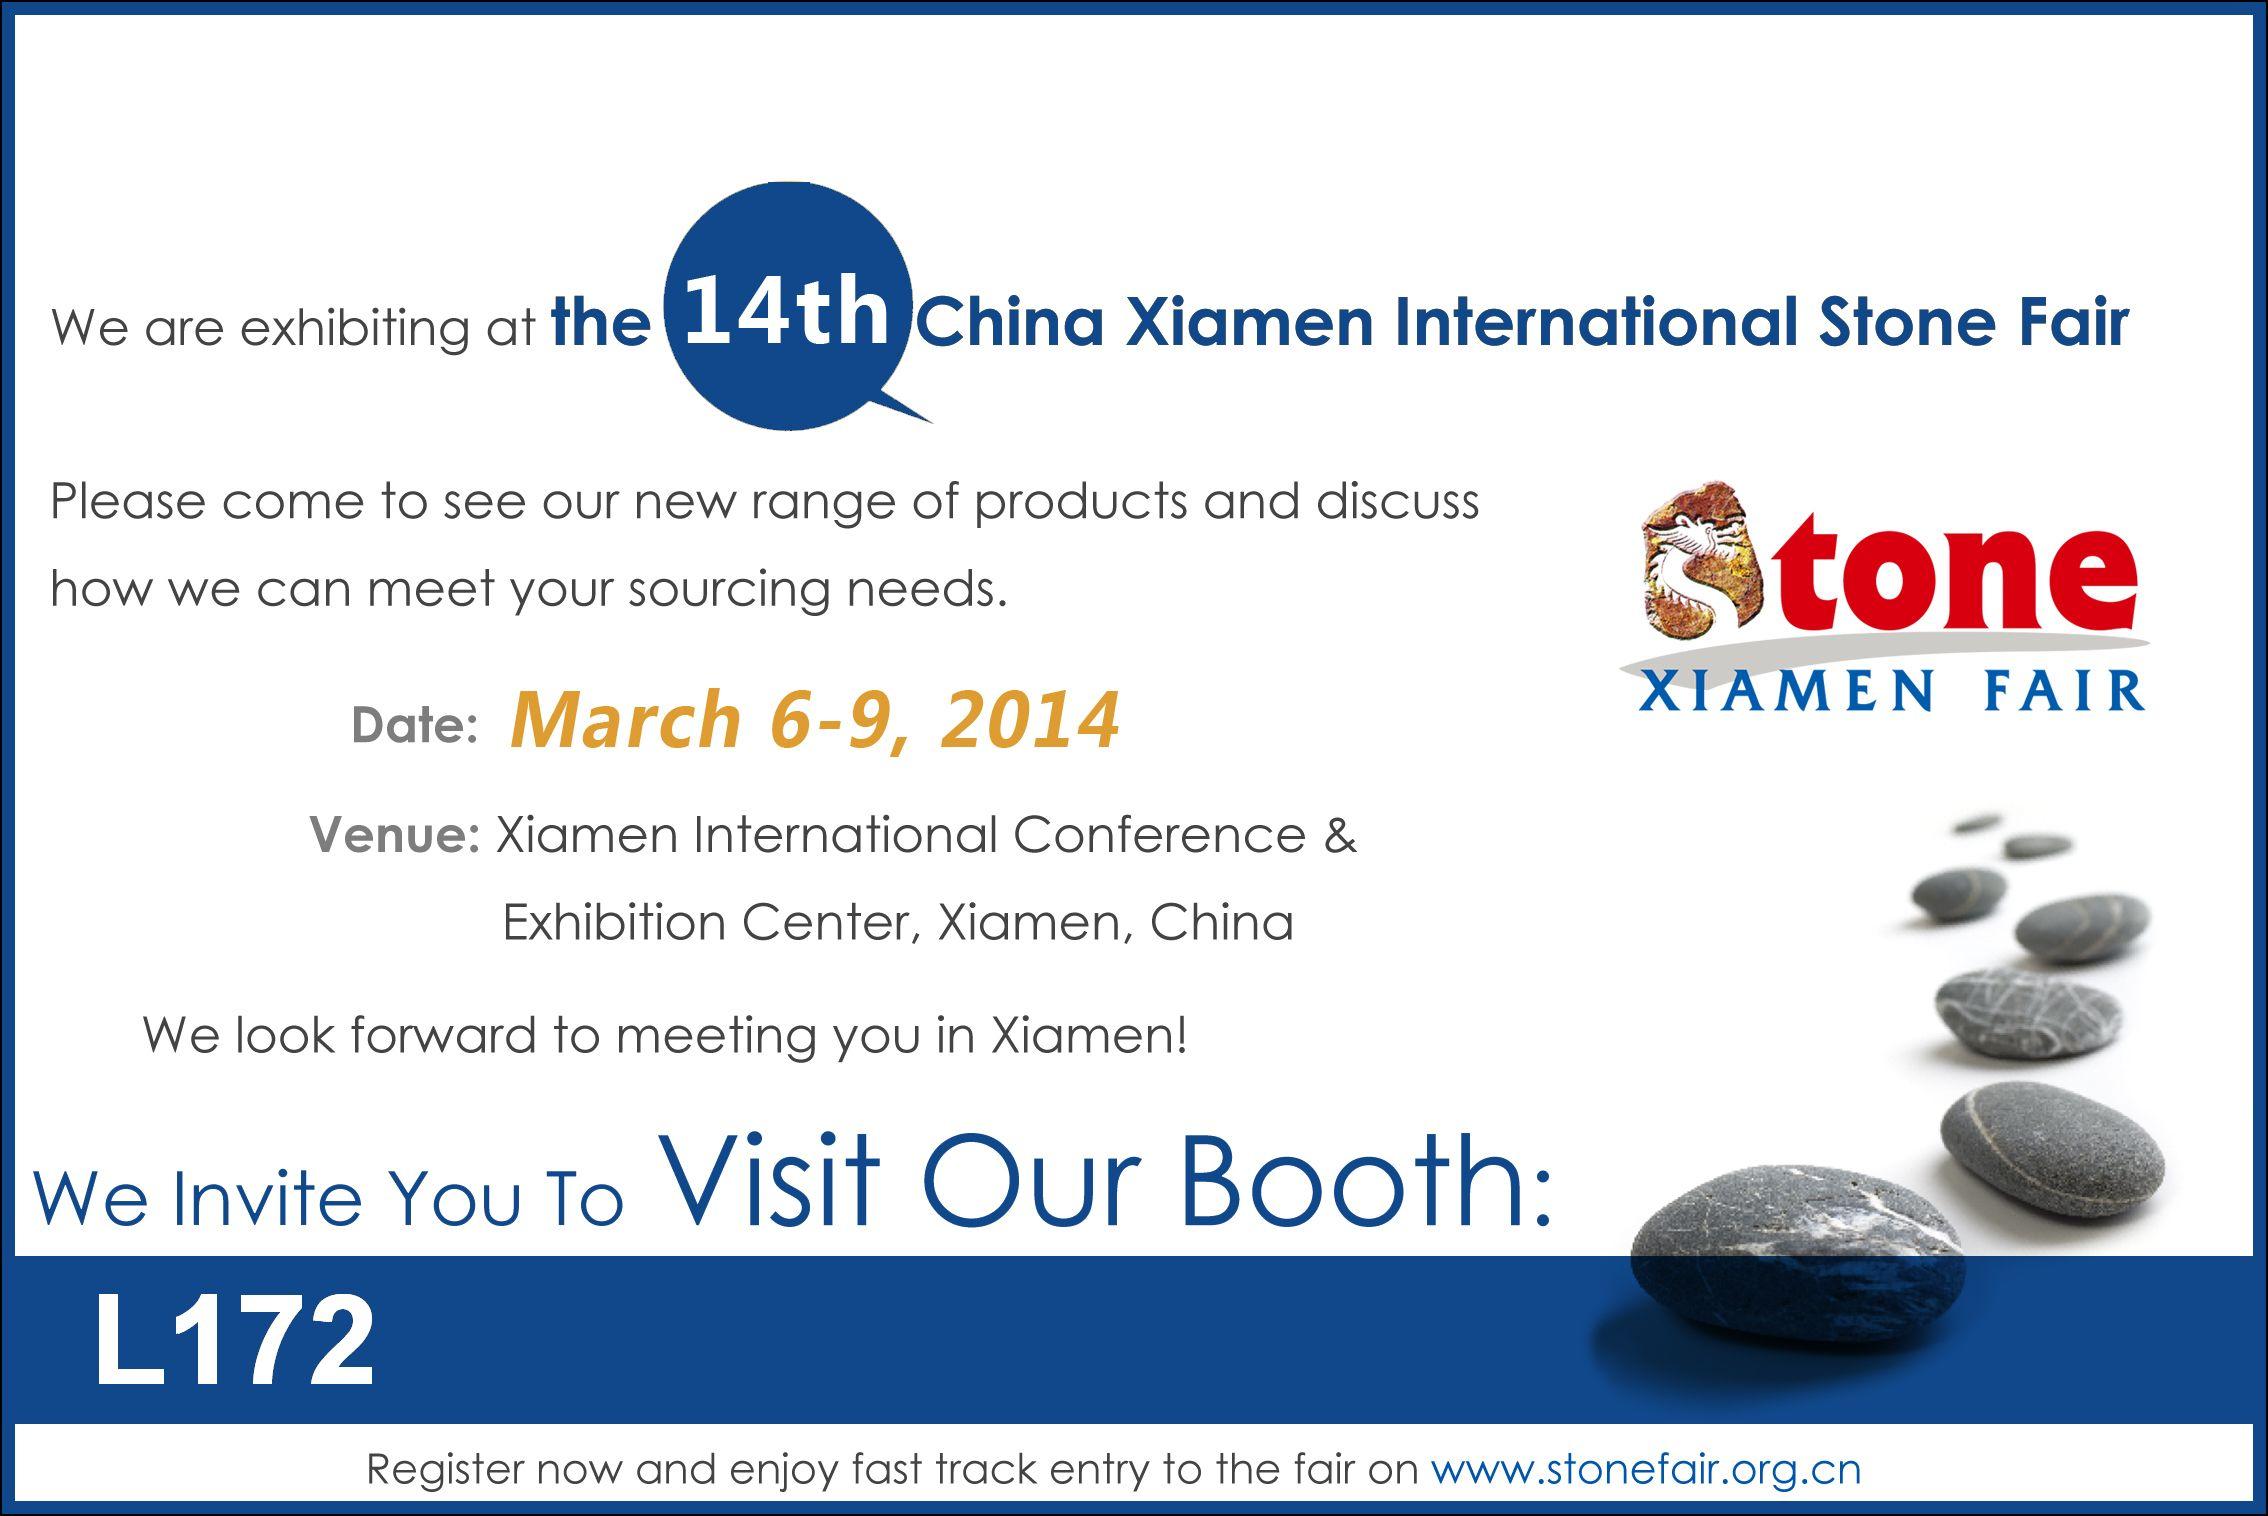 2014 China Xiamen International Stone Fair